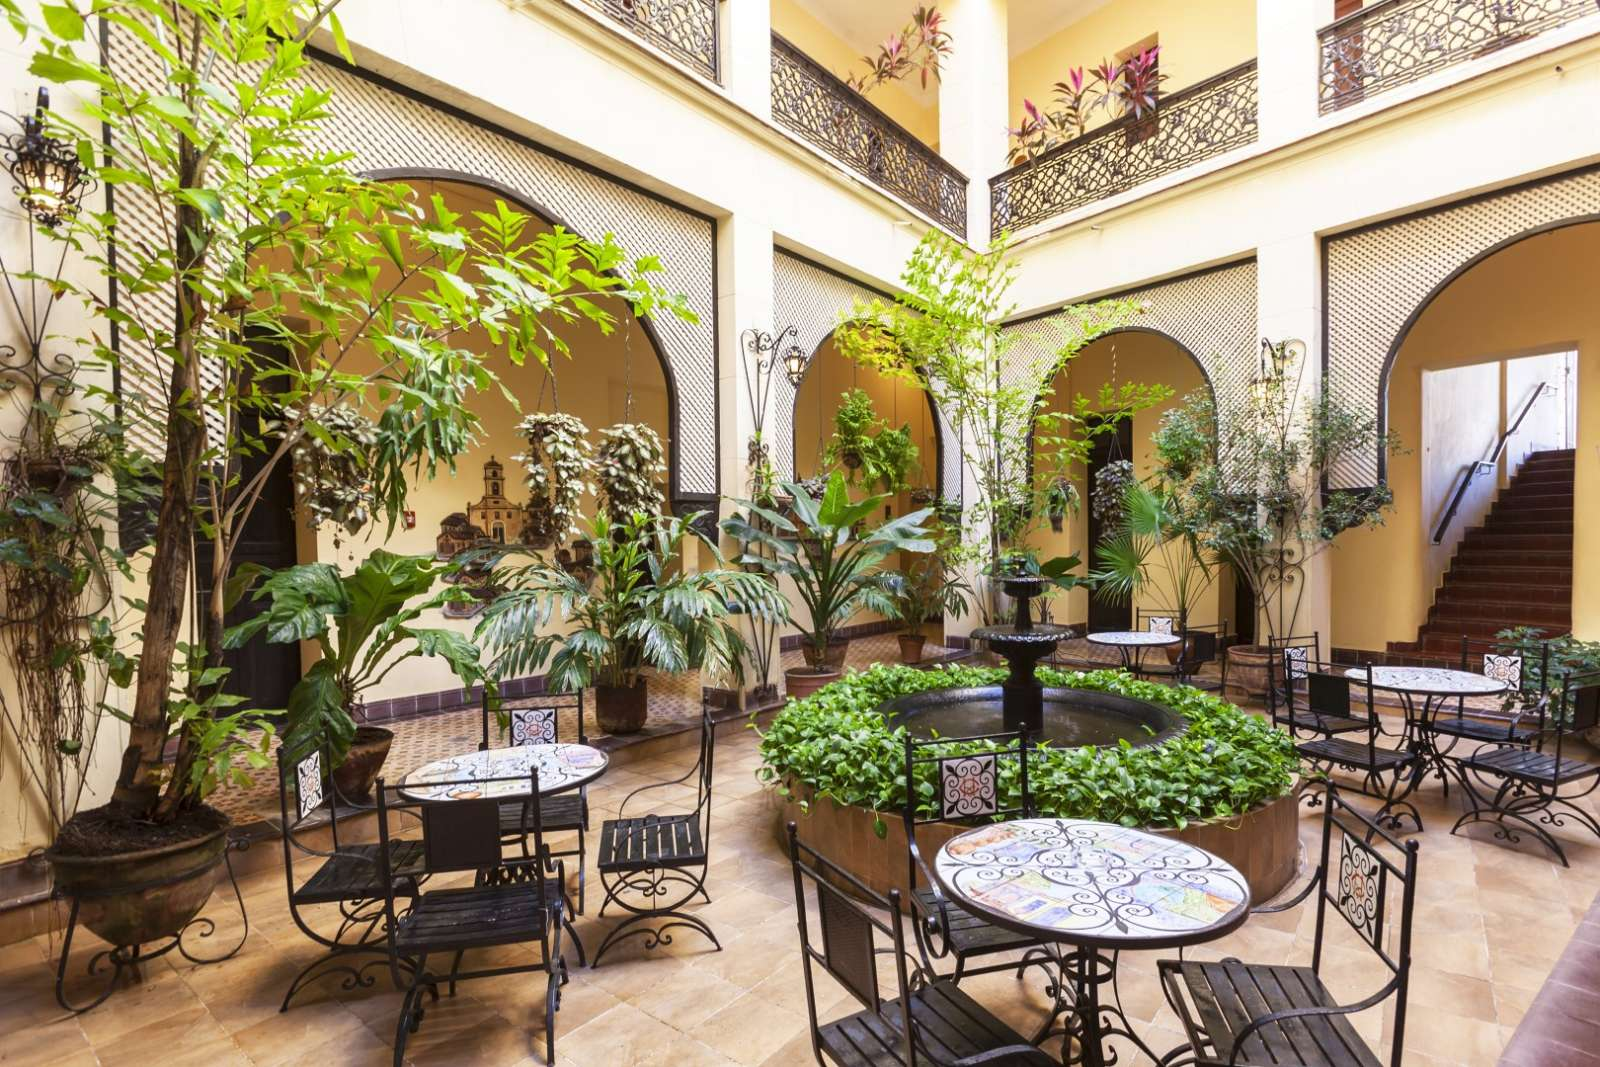 Courtyard at Melia Gran Camaguey